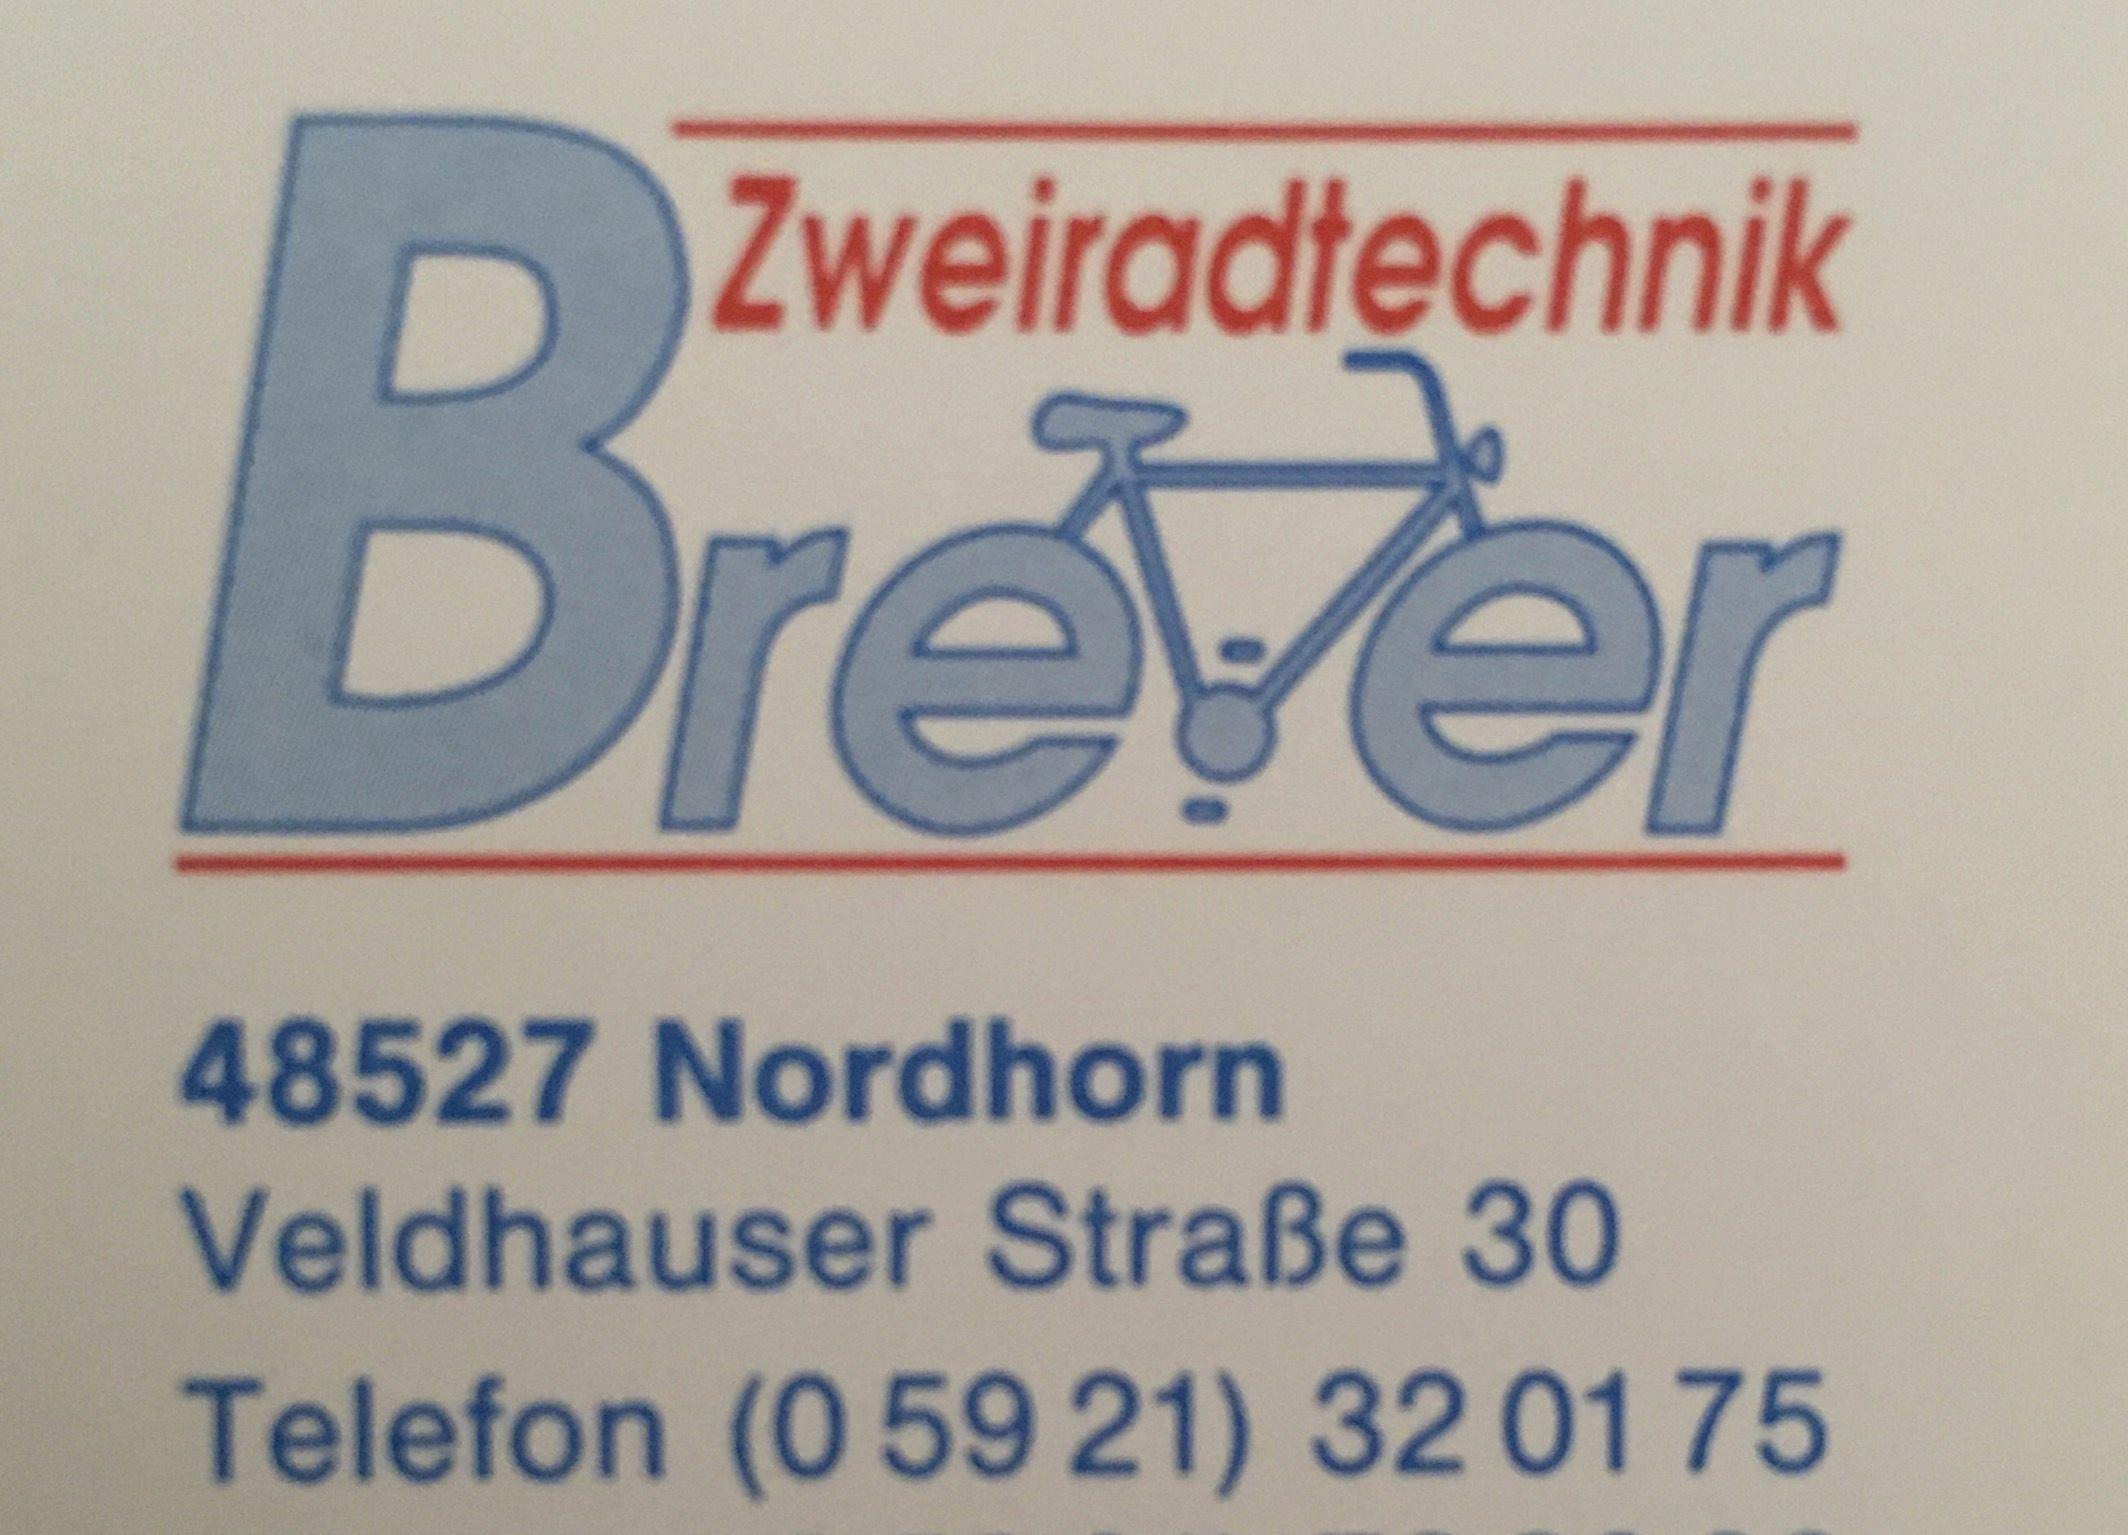 Zweiradtechnik Breer